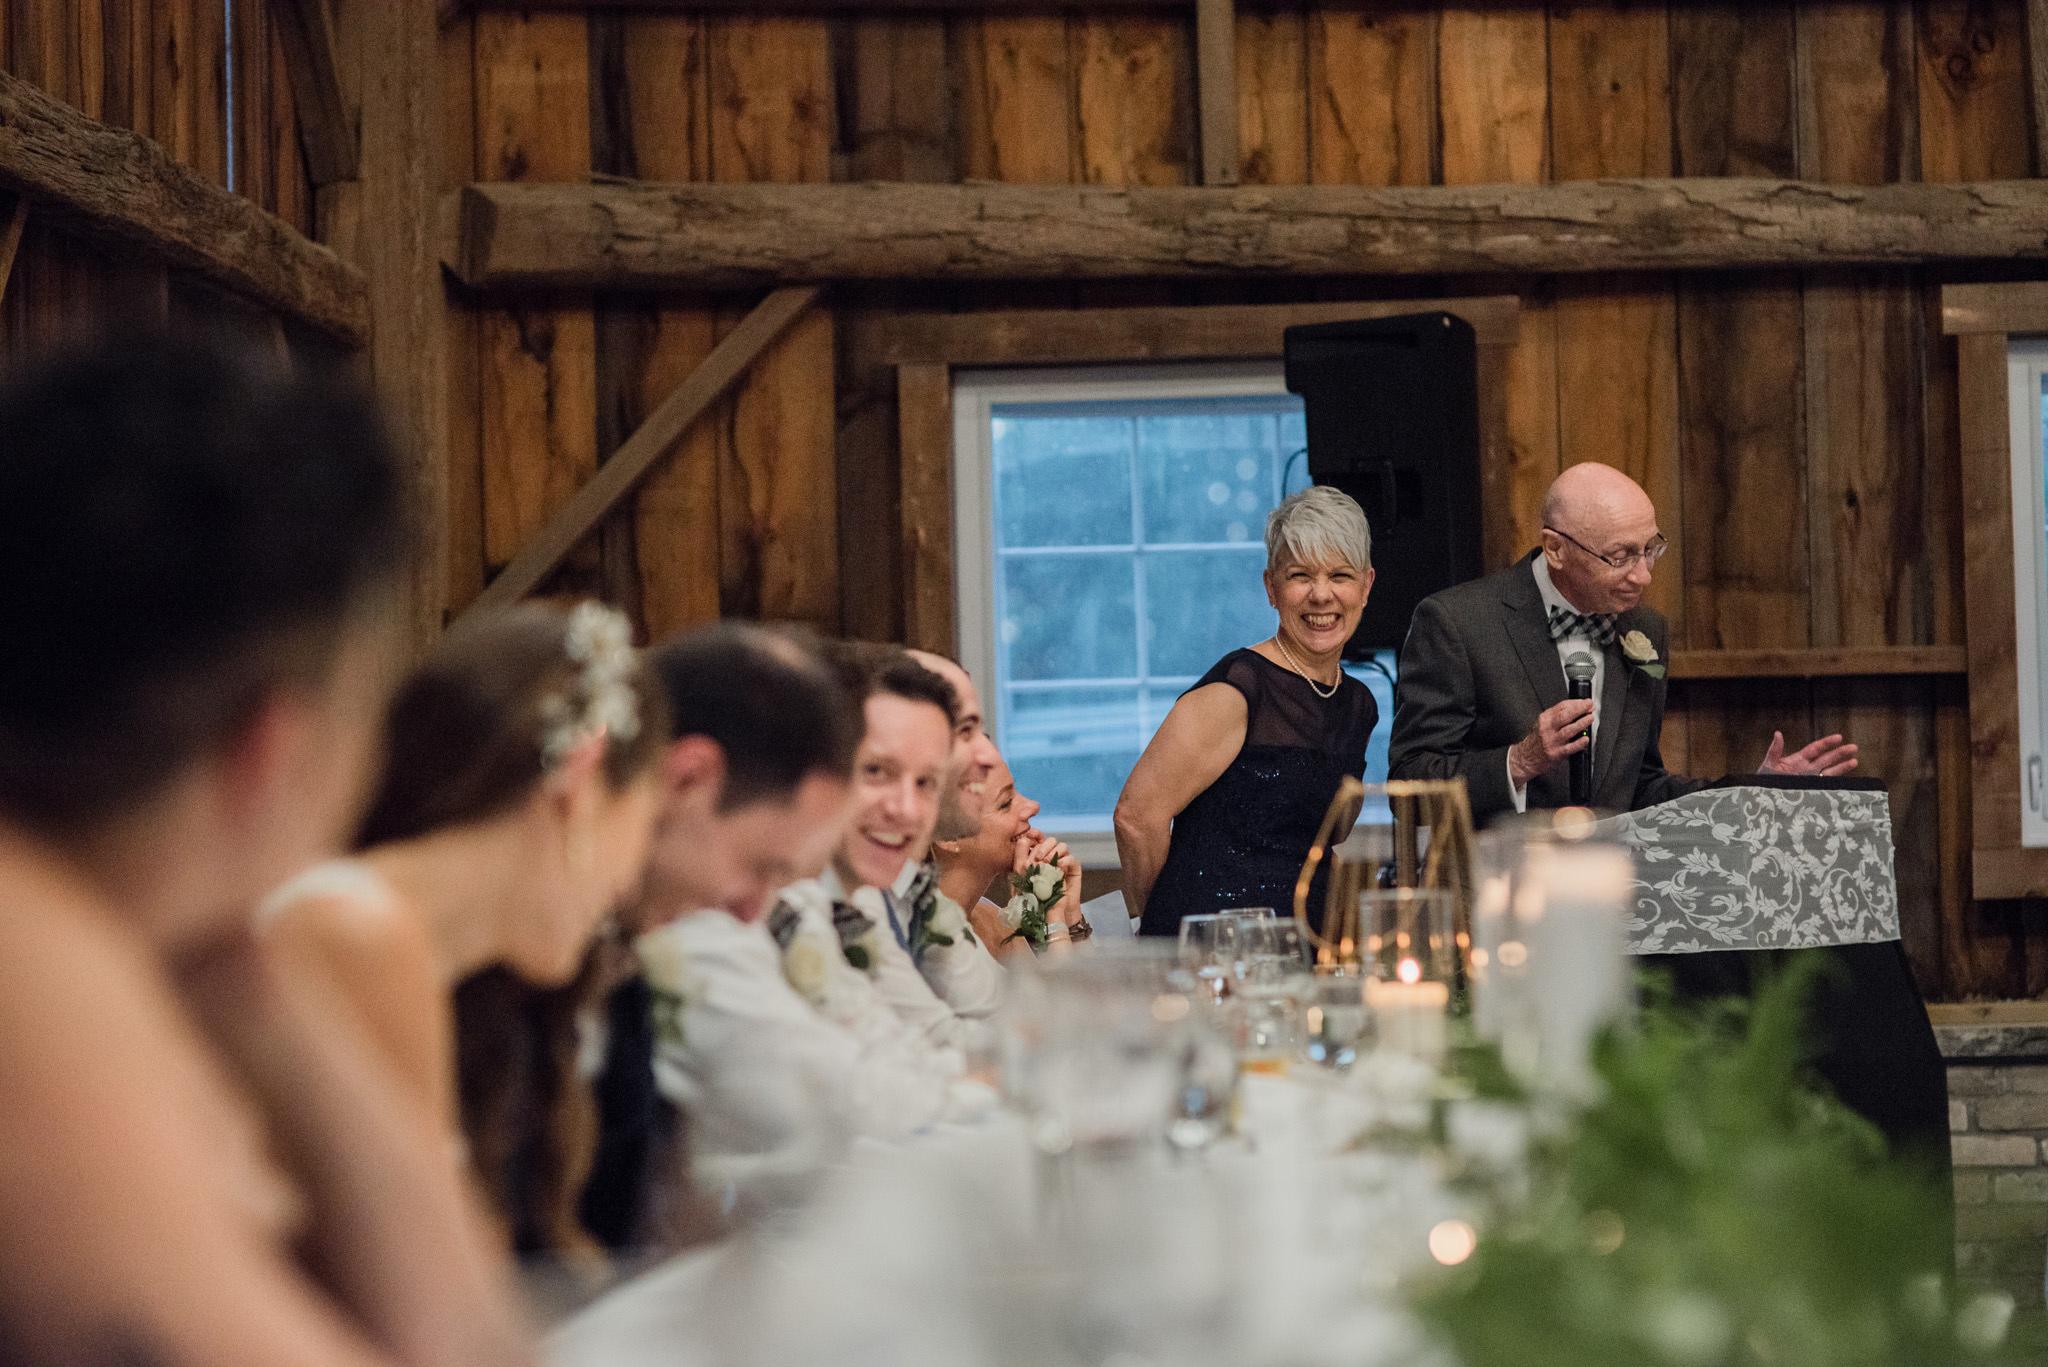 089-sydenham-ridge-wedding-reception.jpg